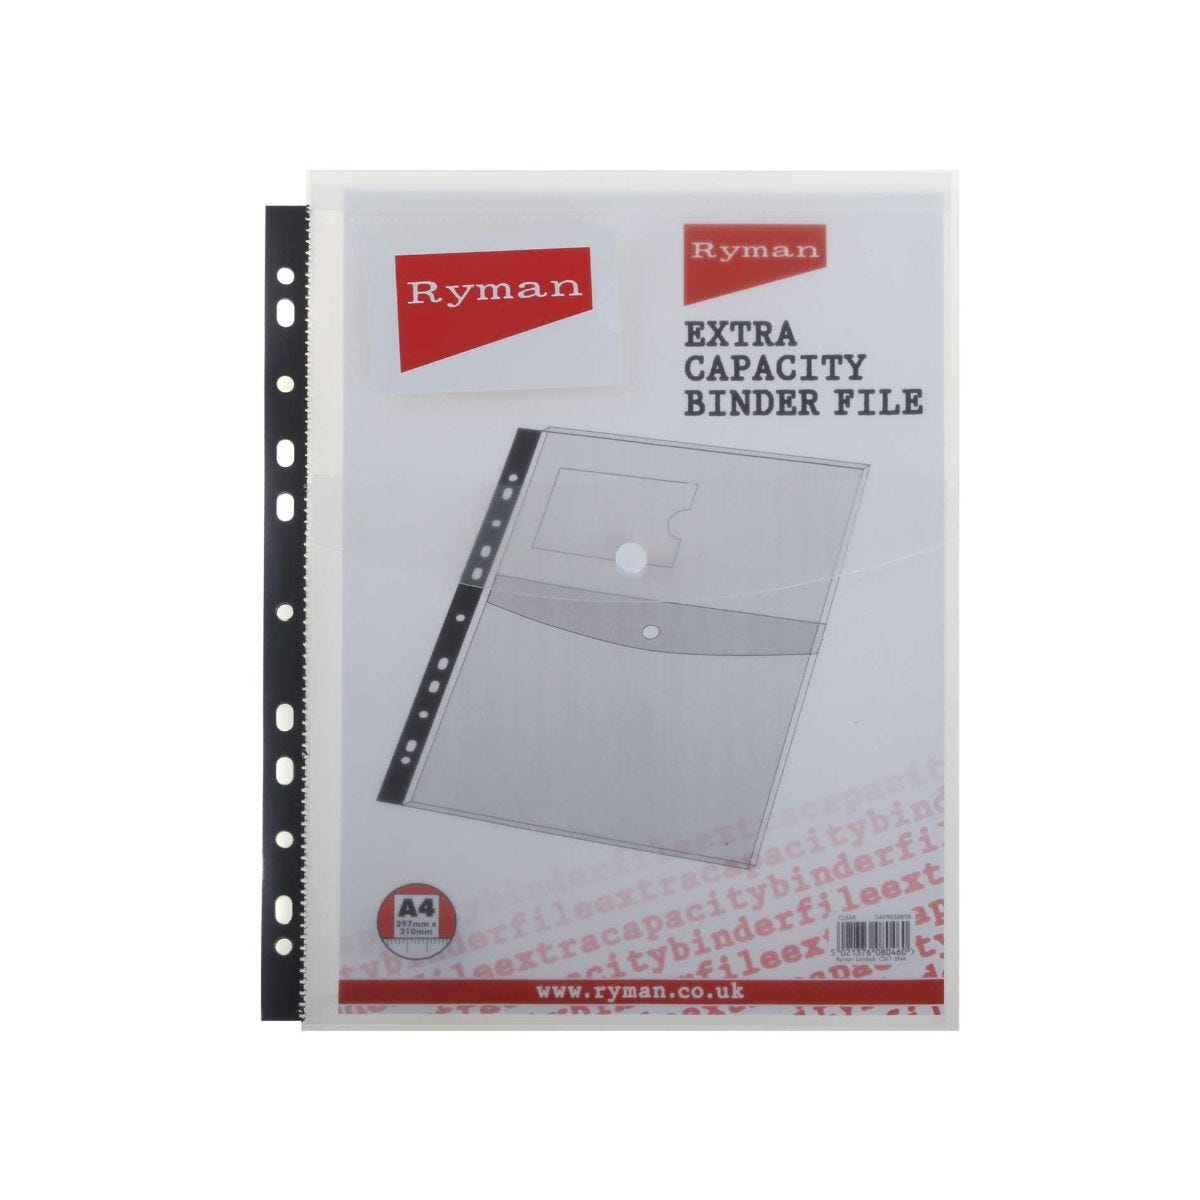 Ryman Binder File A4 Extra Capacity